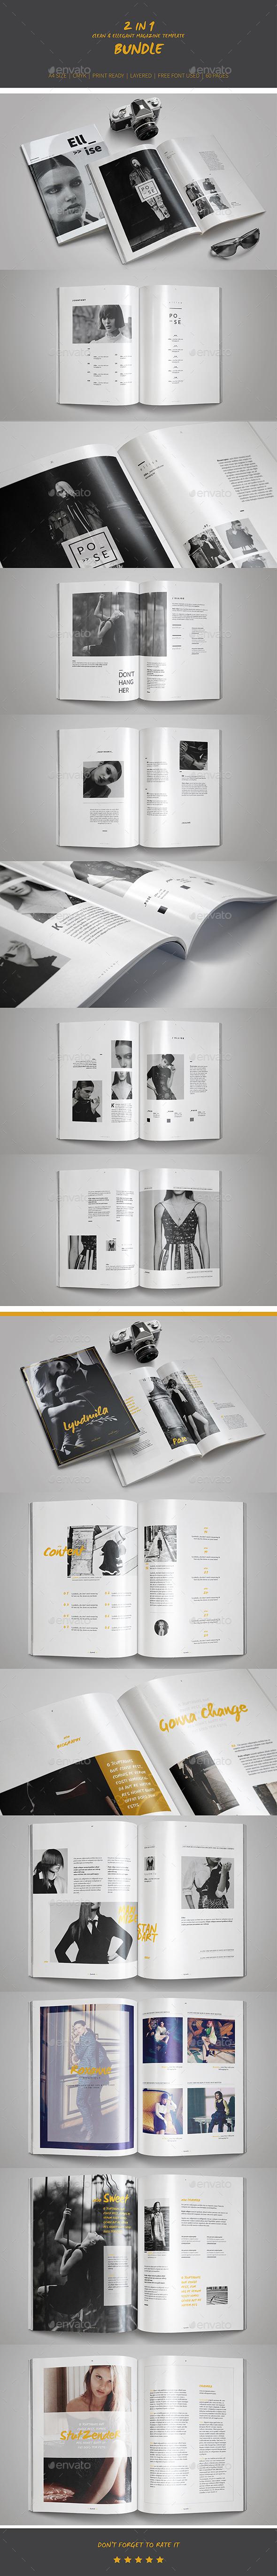 2 in 1 Multipurpose Magazine Template Bundle - Magazines Print Templates